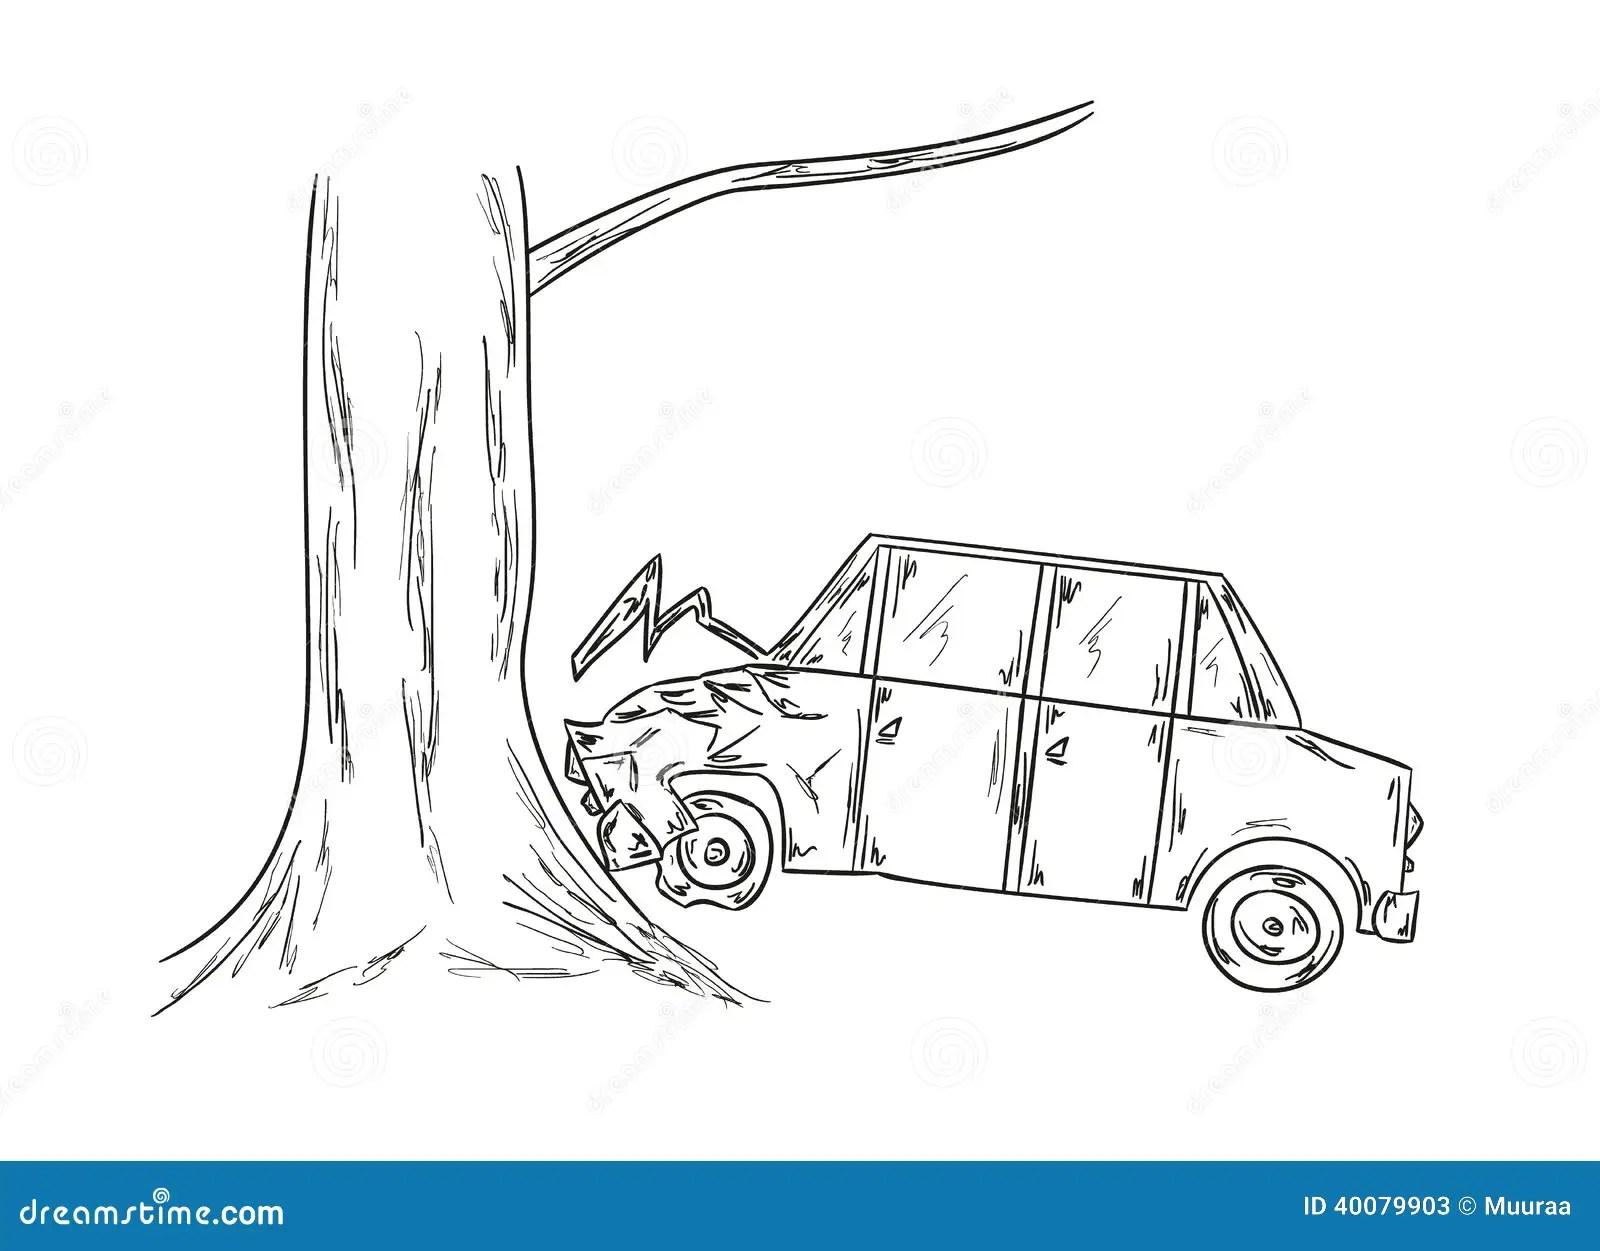 Autounfallskizze Vektor Abbildung